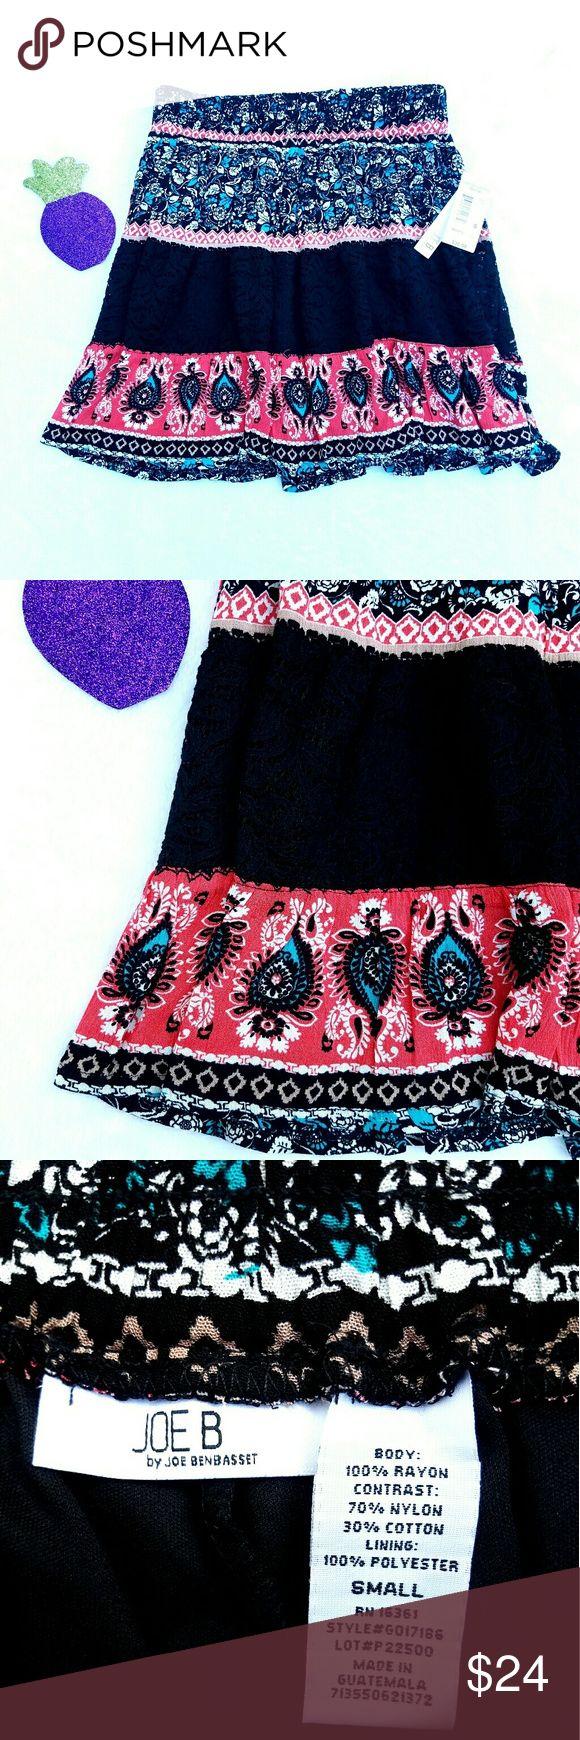 🍍 NWT Joe Biden Small Boho Festival Skirt NWT Joe Biden Small Boho Festival Skirt   🍍25% OFF on bundles   Inventory #67 joe B Skirts Mini